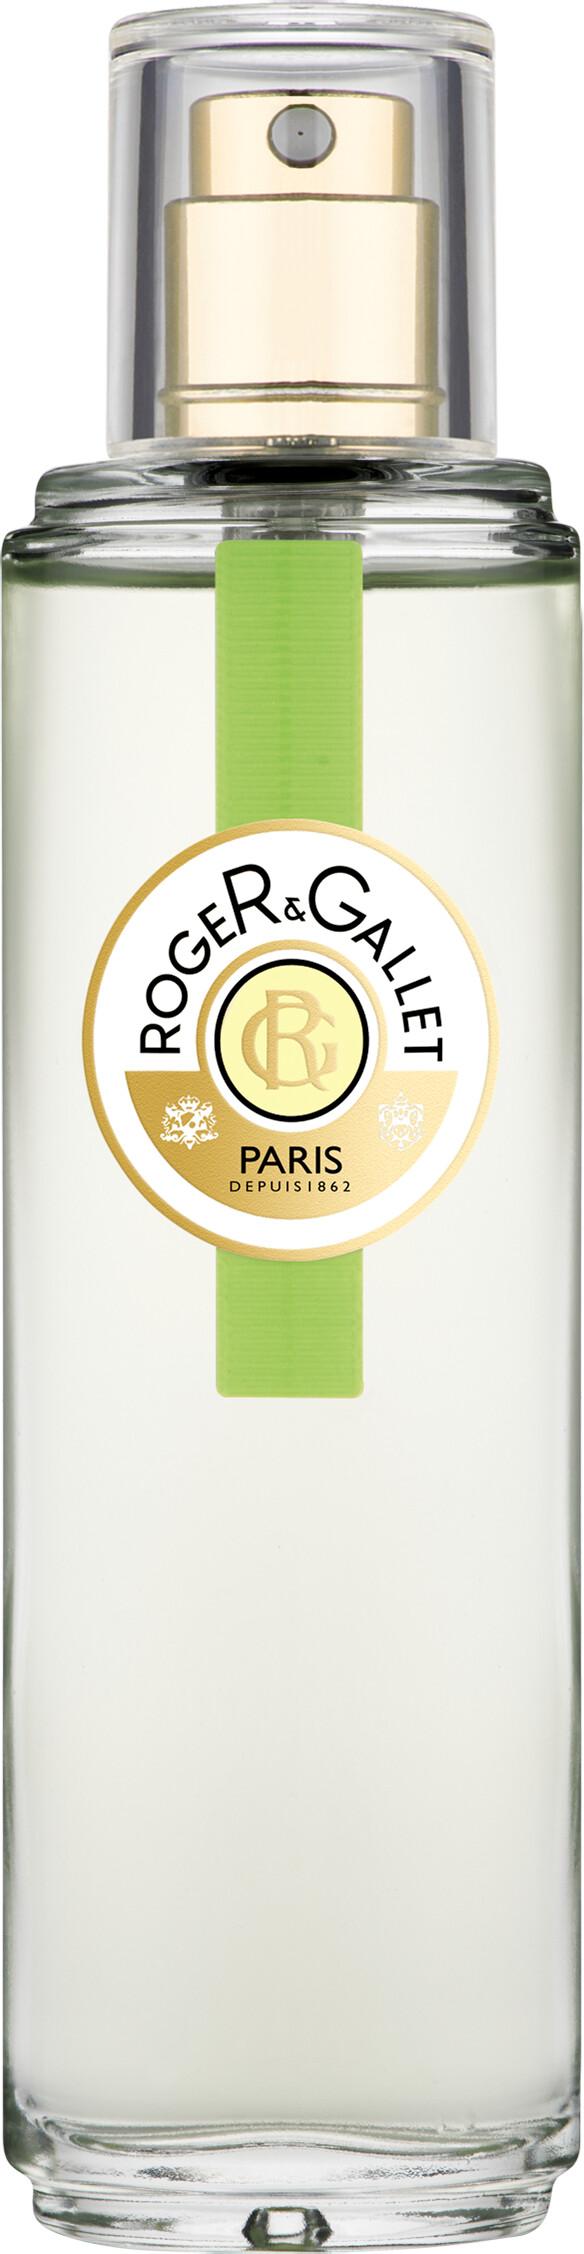 Roger & Gallet Citron Fragrant Water Spray 30ml